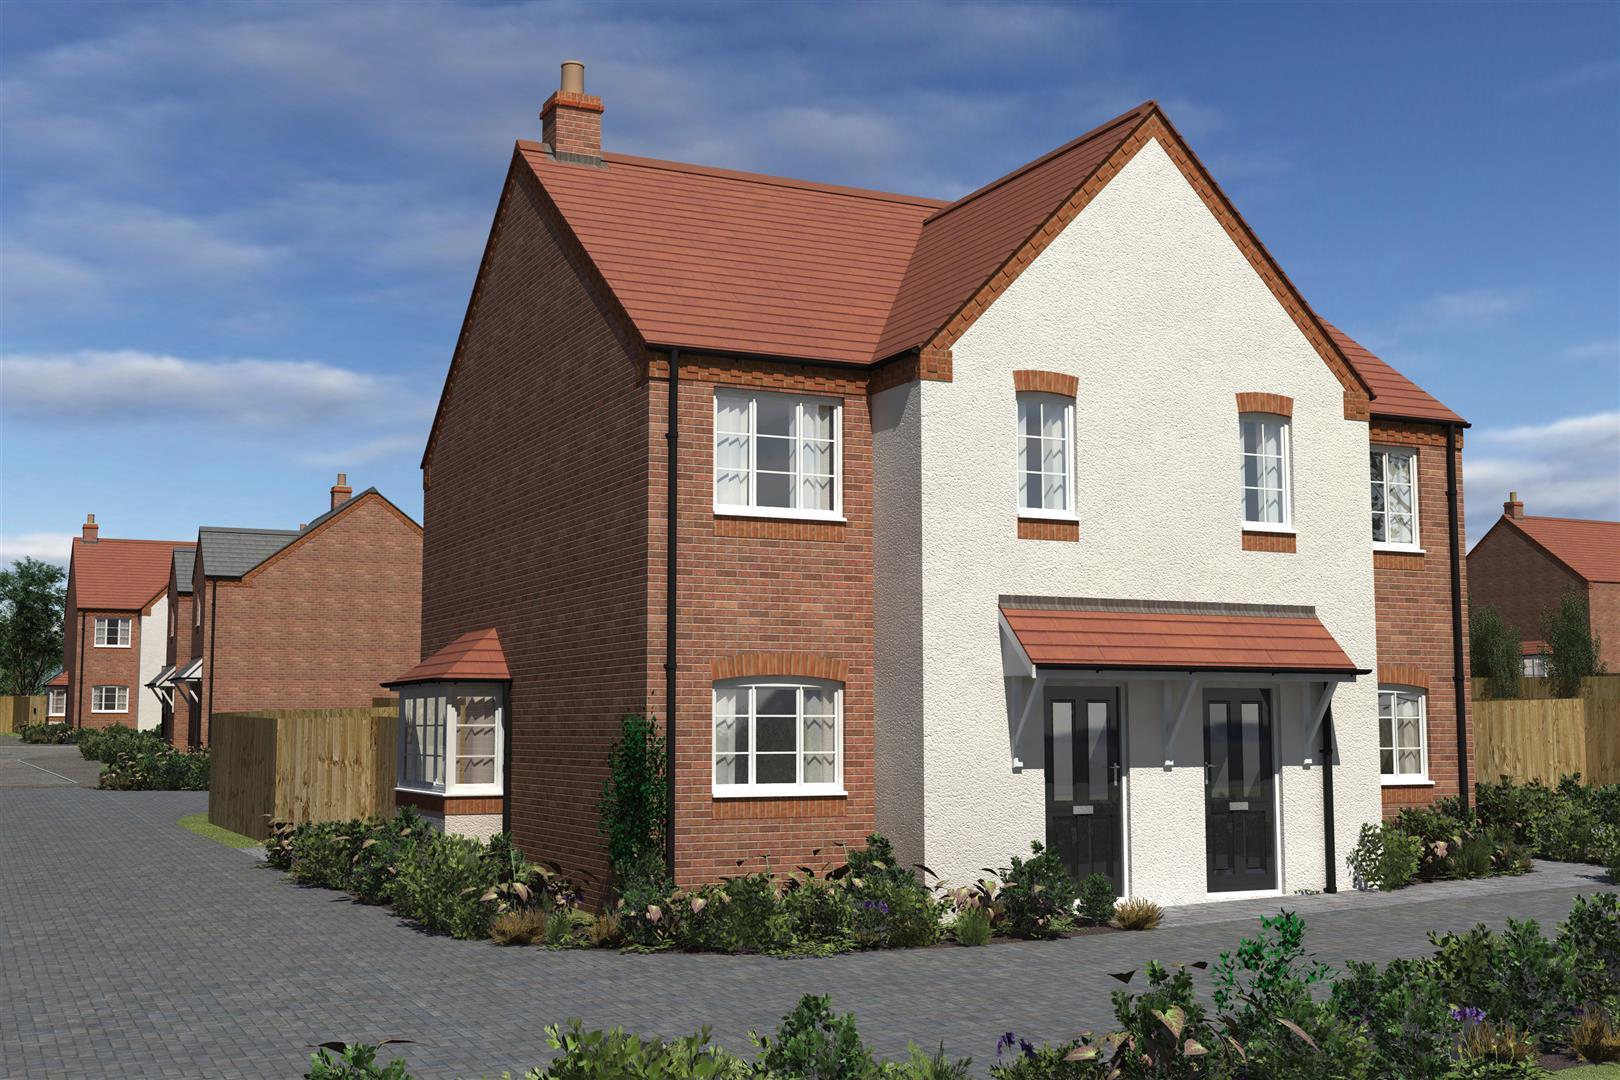 3 Bedrooms House for sale in Sherbourne Gardens, Bridgenorth Road, Highley